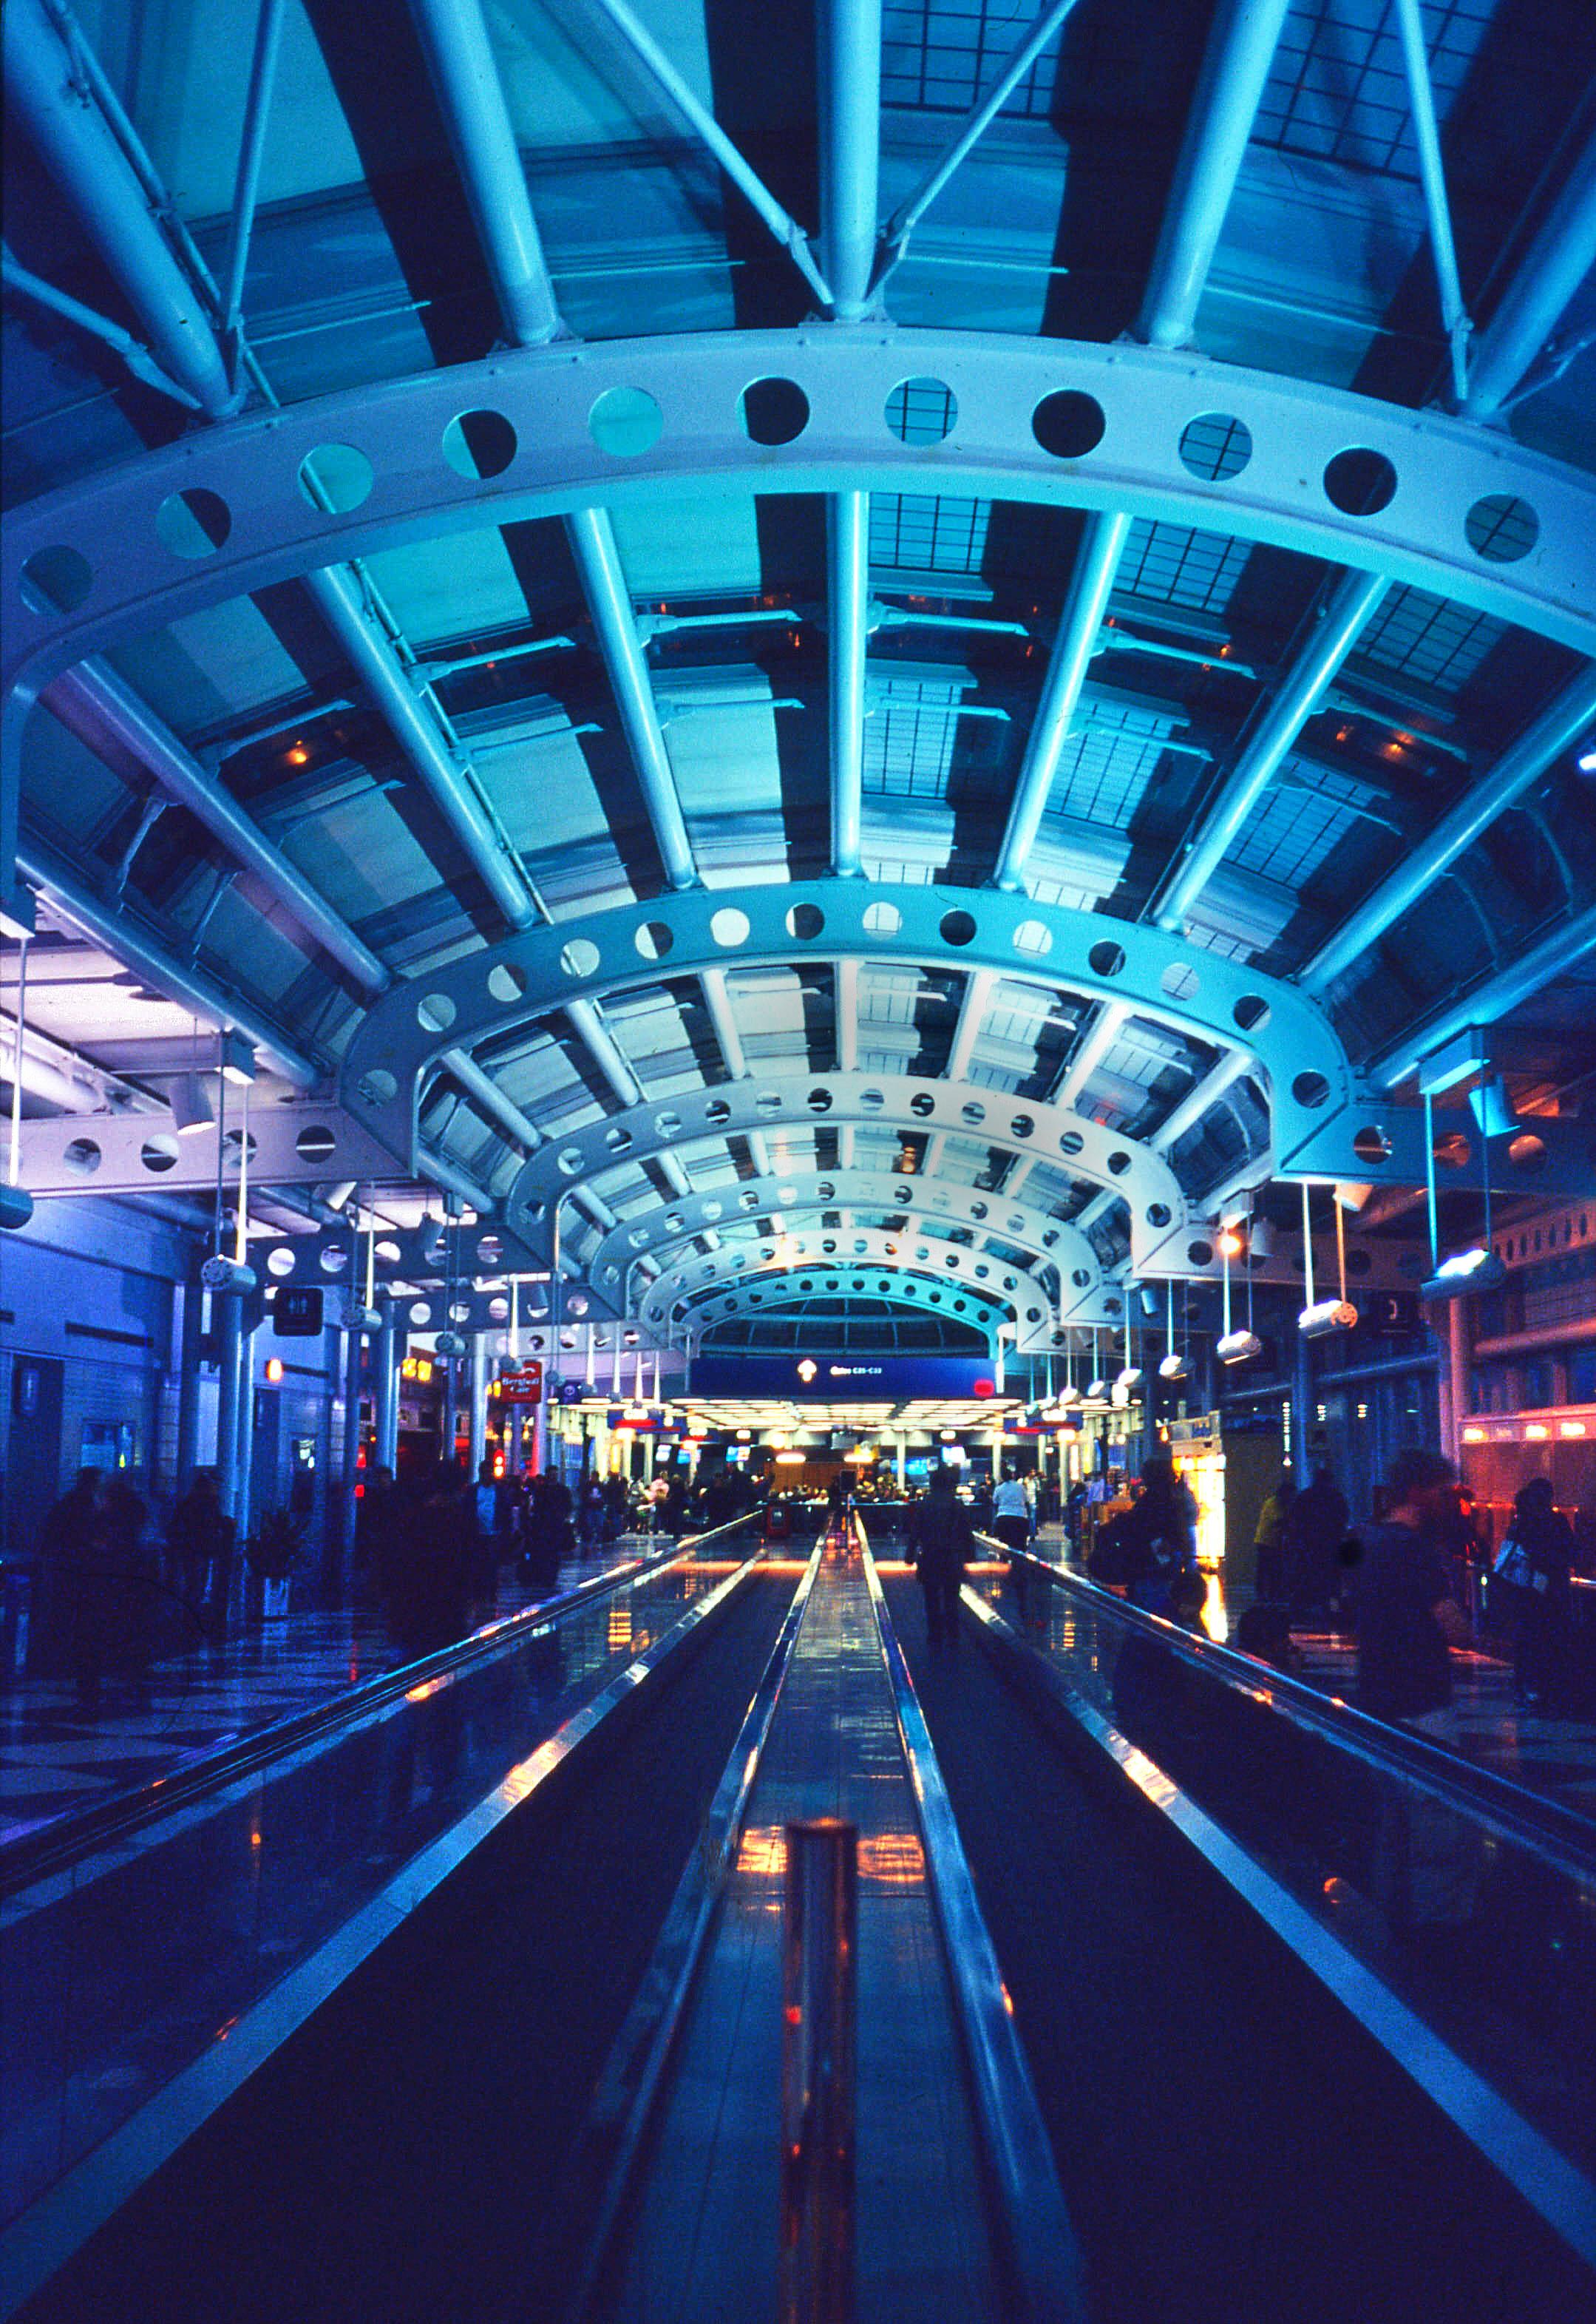 Chicago O'Hare International Airport / Kodak Ektachrome 100VS